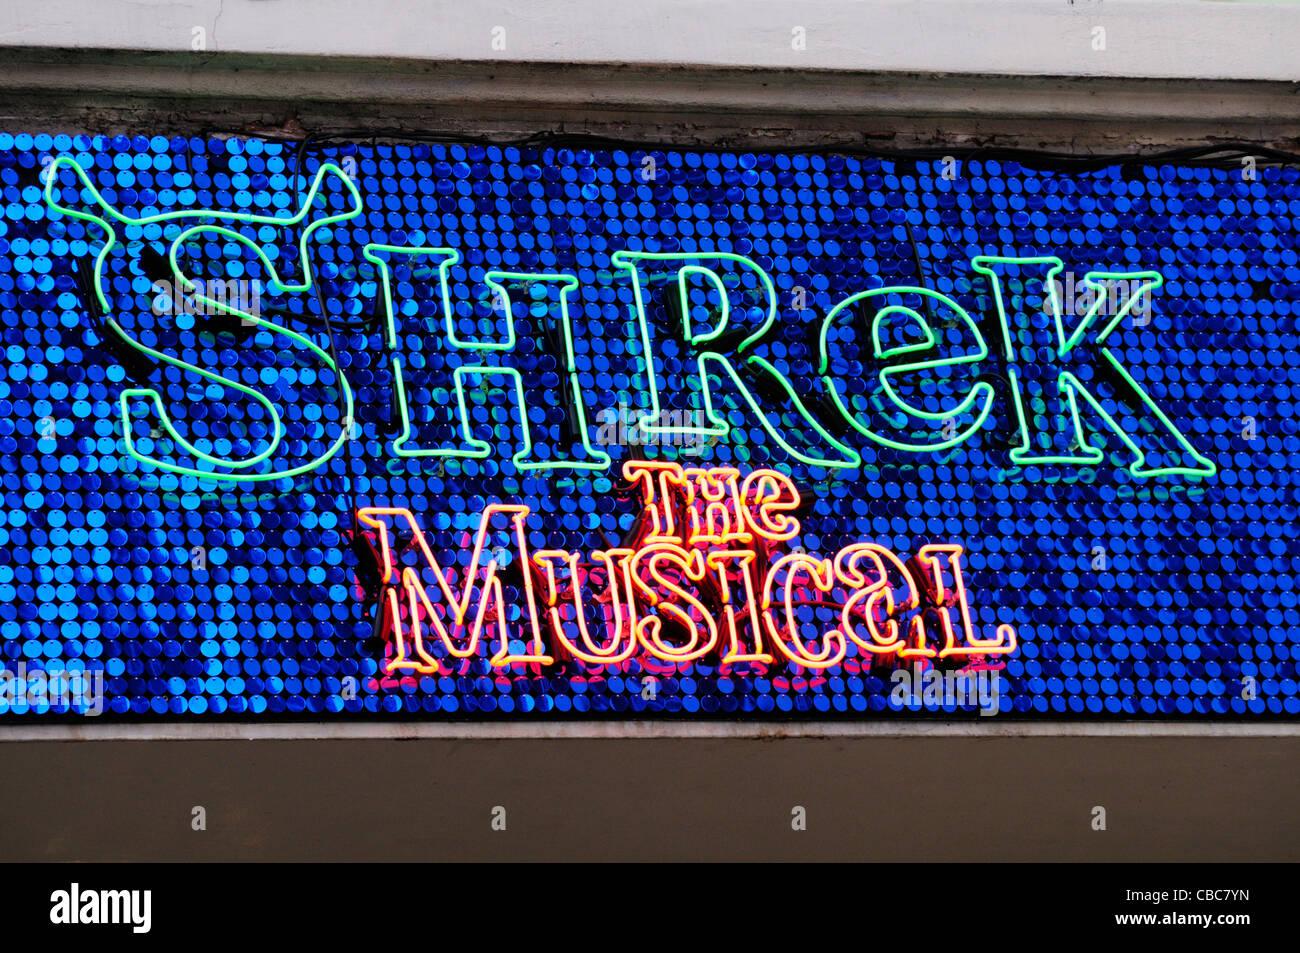 Shrek The Musical Sign, Theatre Royal, Drury Lane, London, England, UK - Stock Image